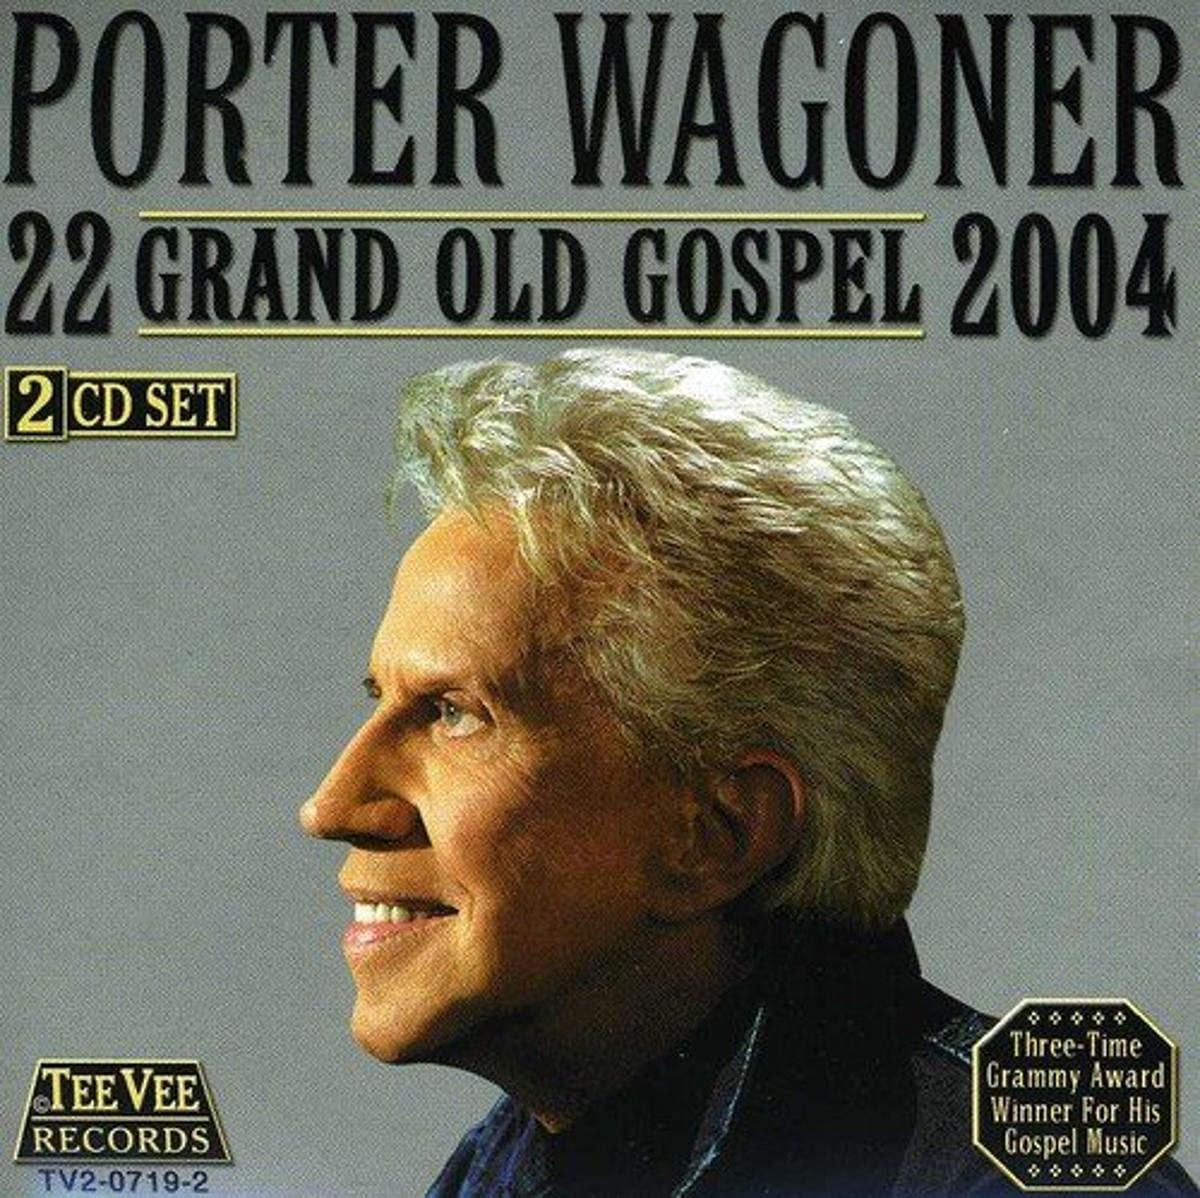 22 Grand Old 2004 service Gospel Regular discount